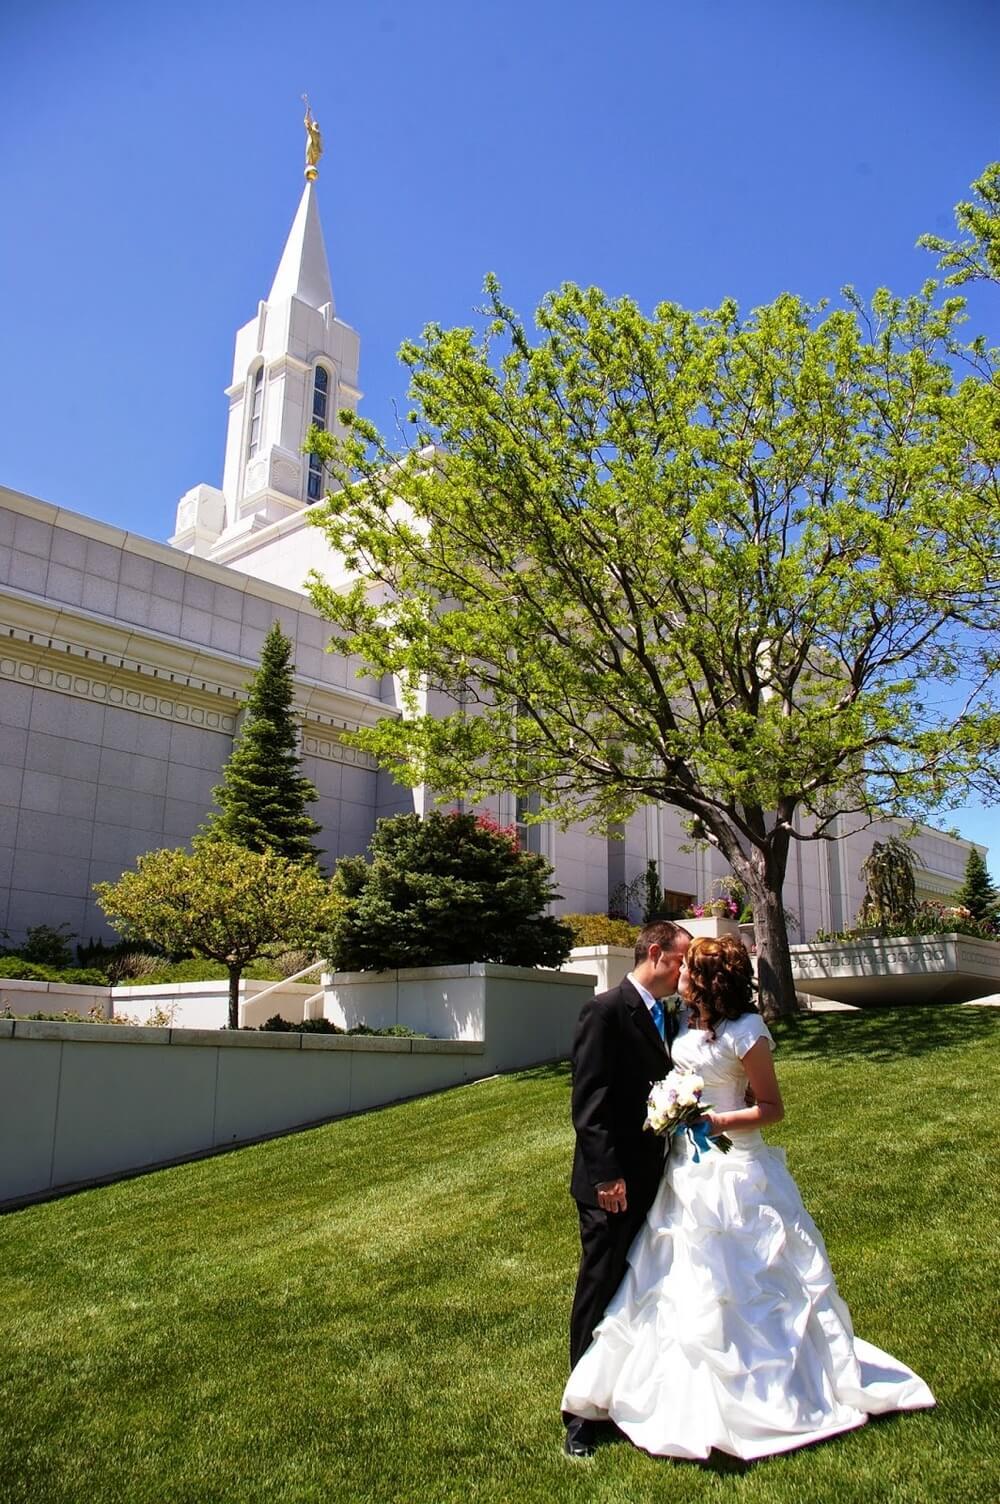 bountiful utah temple wedding photo